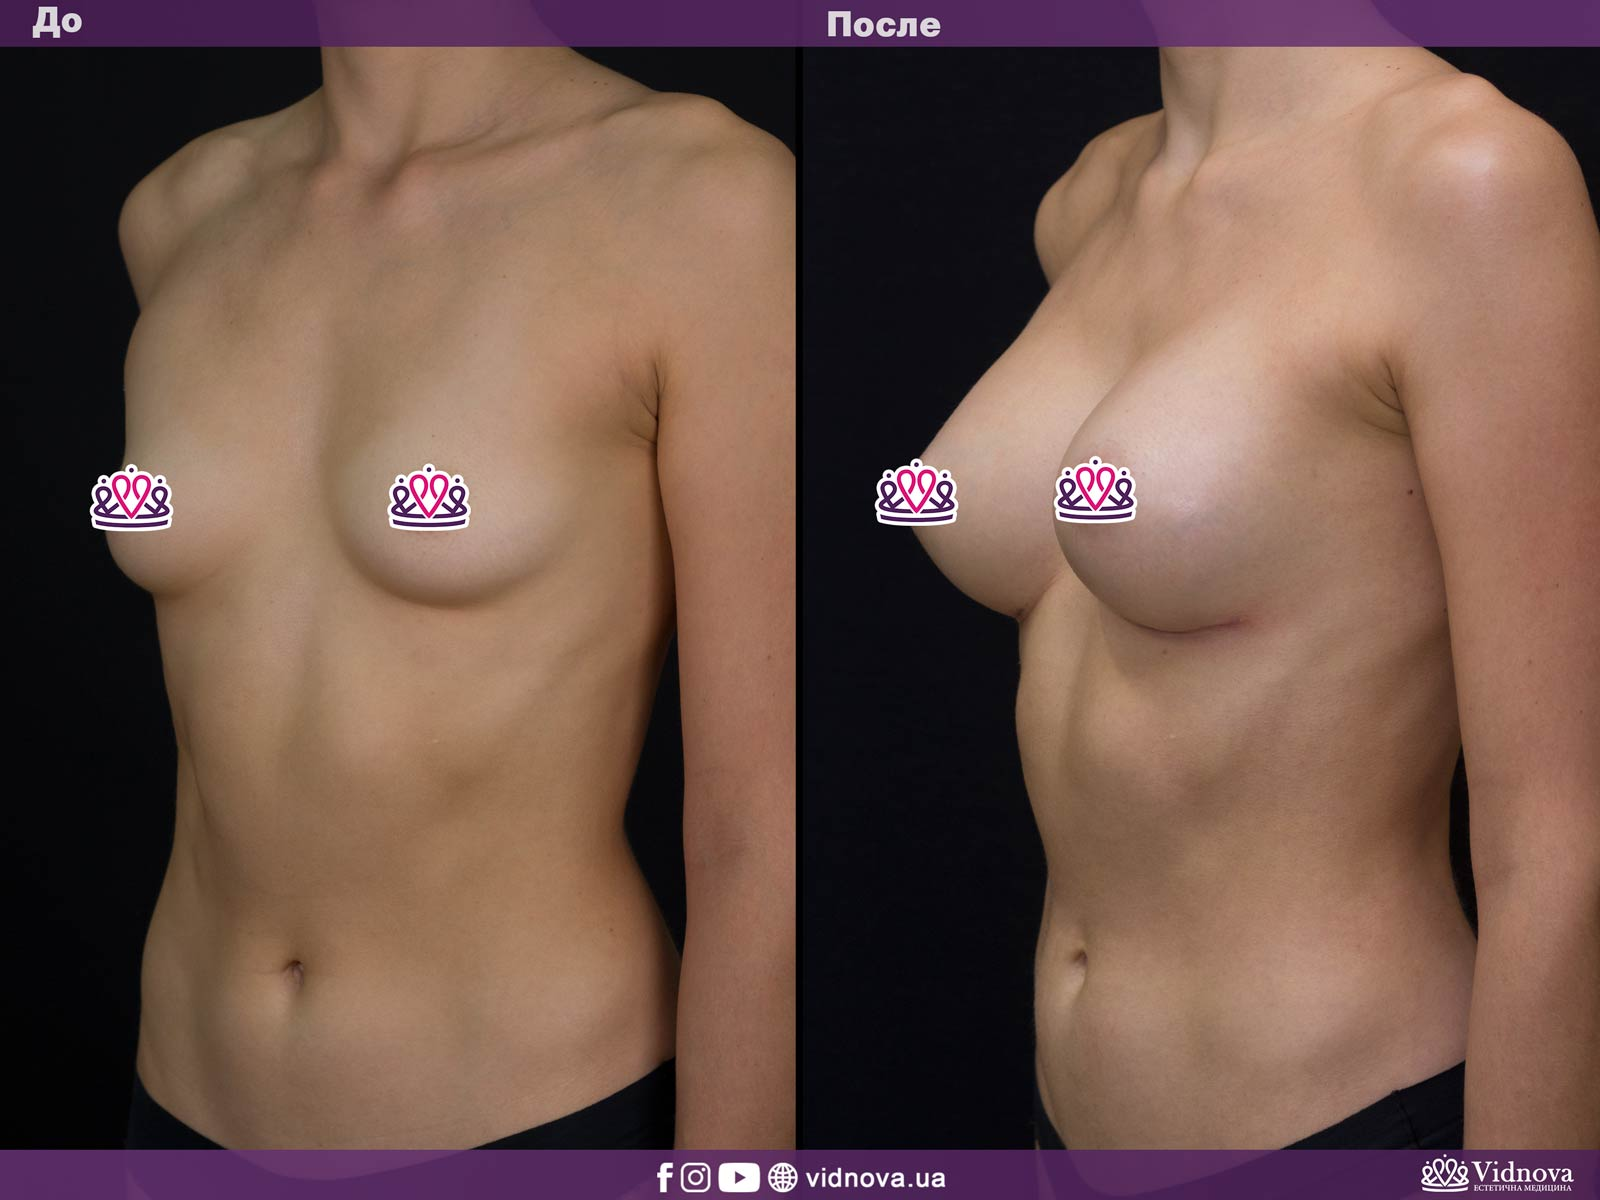 Увеличение груди: Фото ДО и ПОСЛЕ - Пример №8-2 - Клиника Vidnova